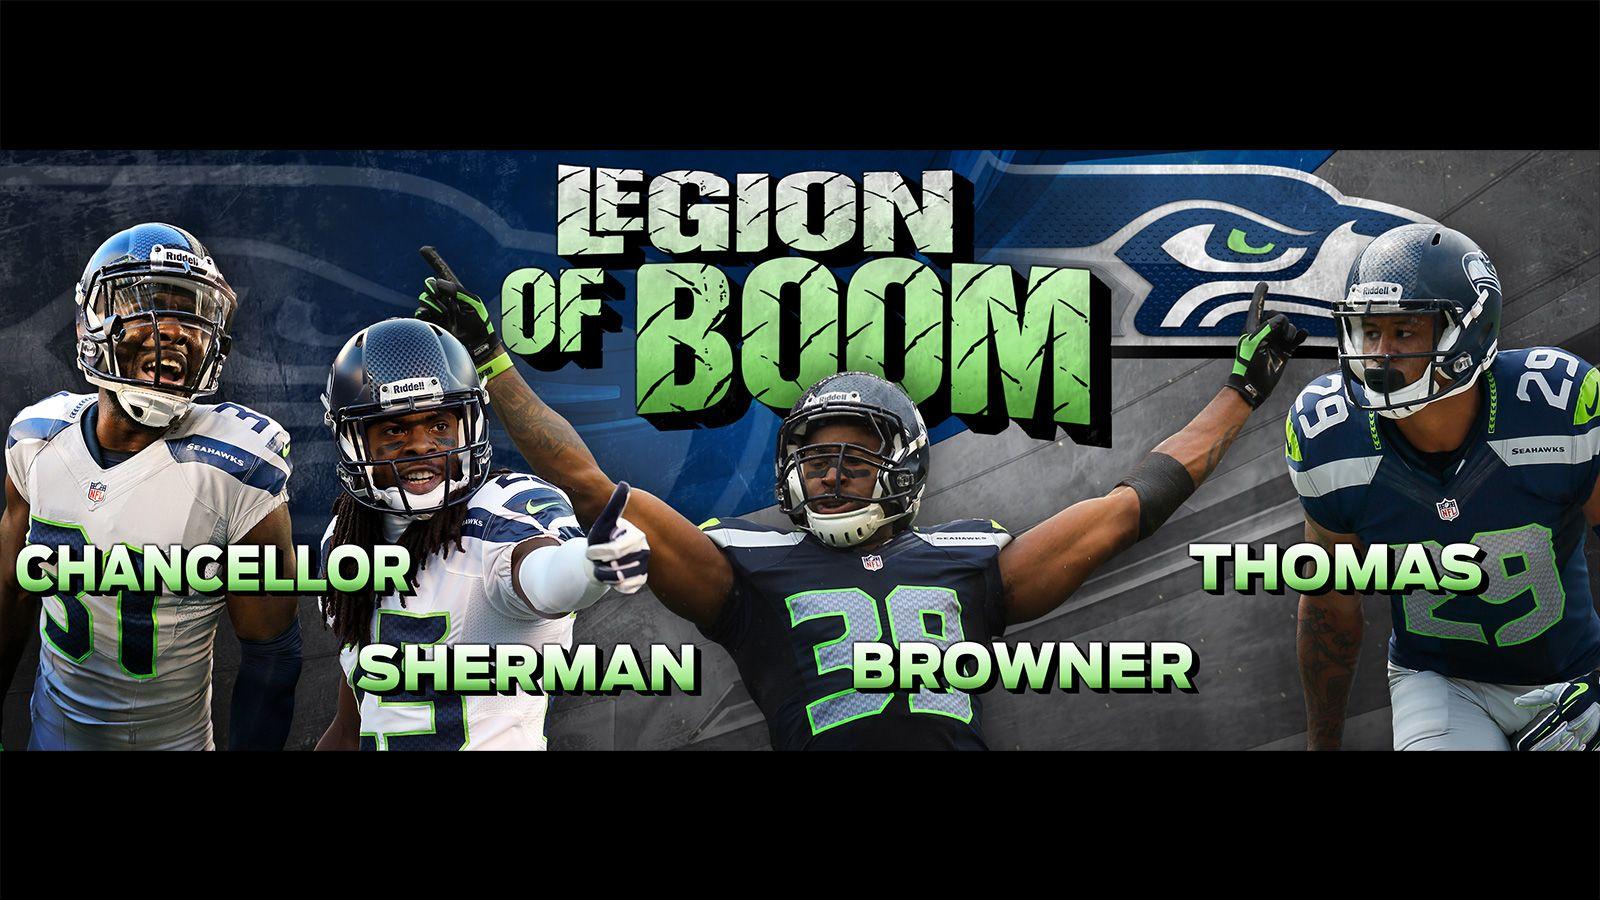 legion of boom pictures 111013FFD_LEGIONOFBOOM_VMON